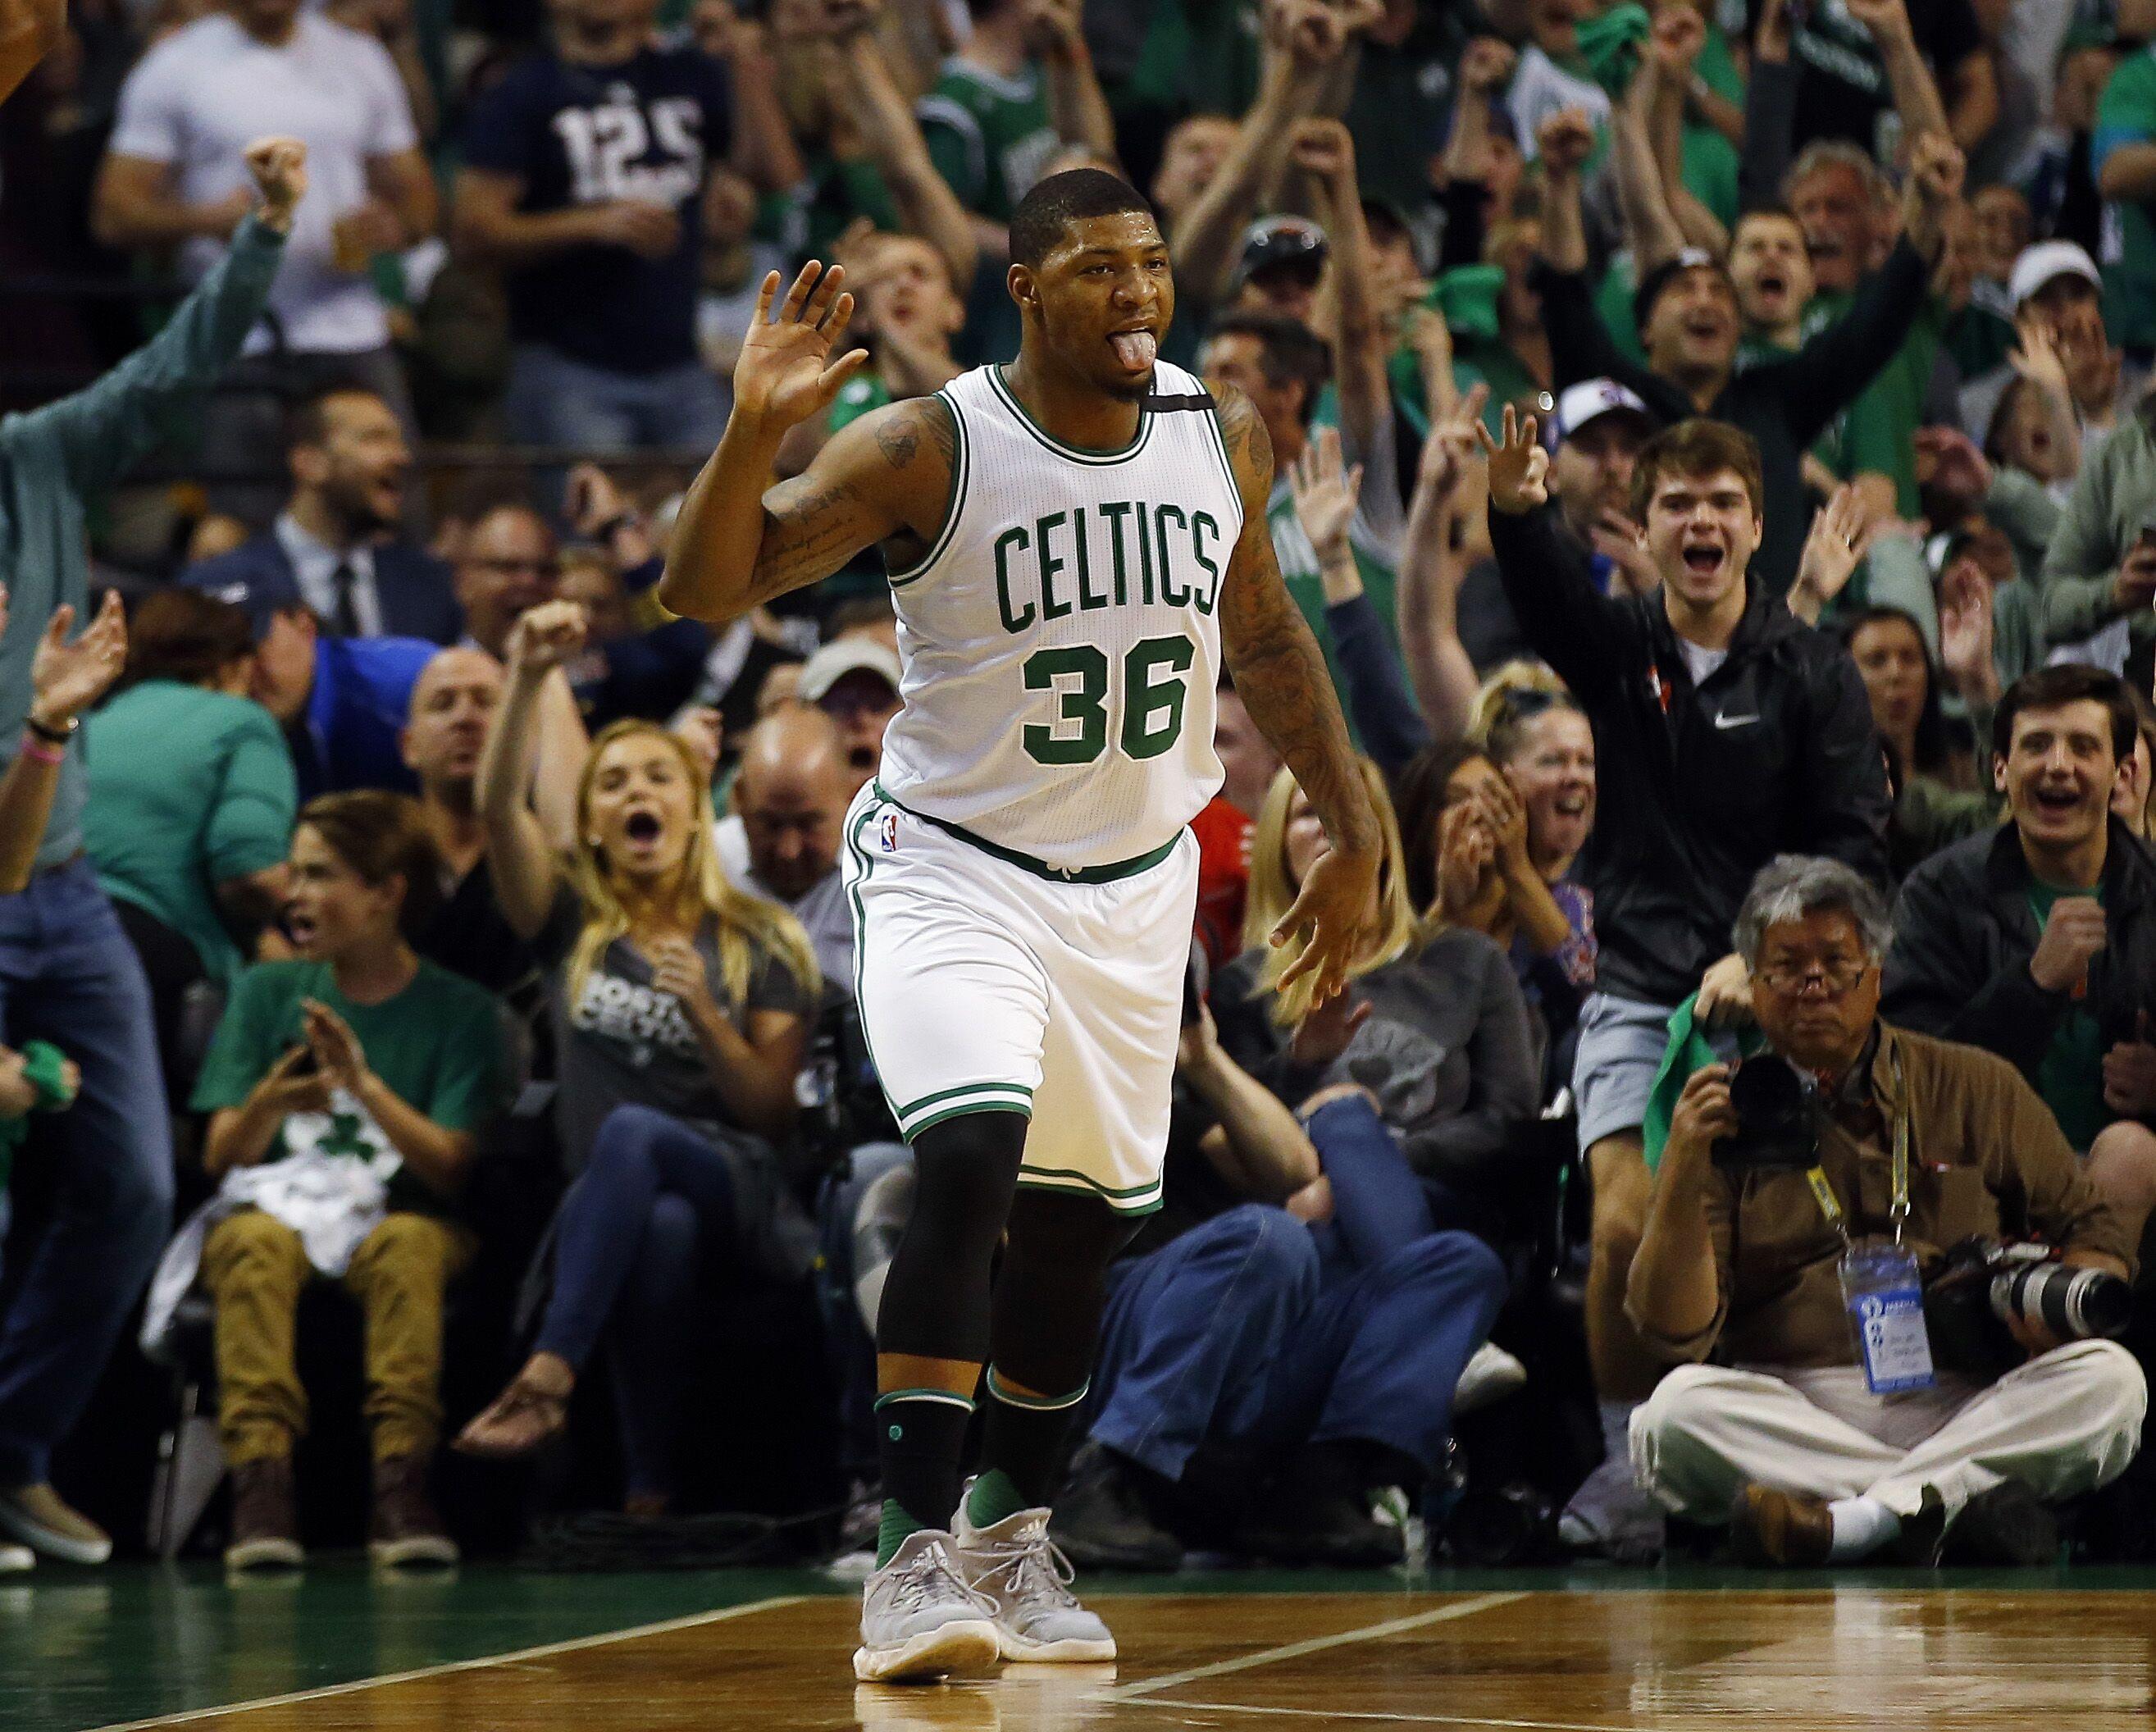 2017 Nba Playoffs Celtics Vs Cavaliers Eastern | All Basketball Scores Info